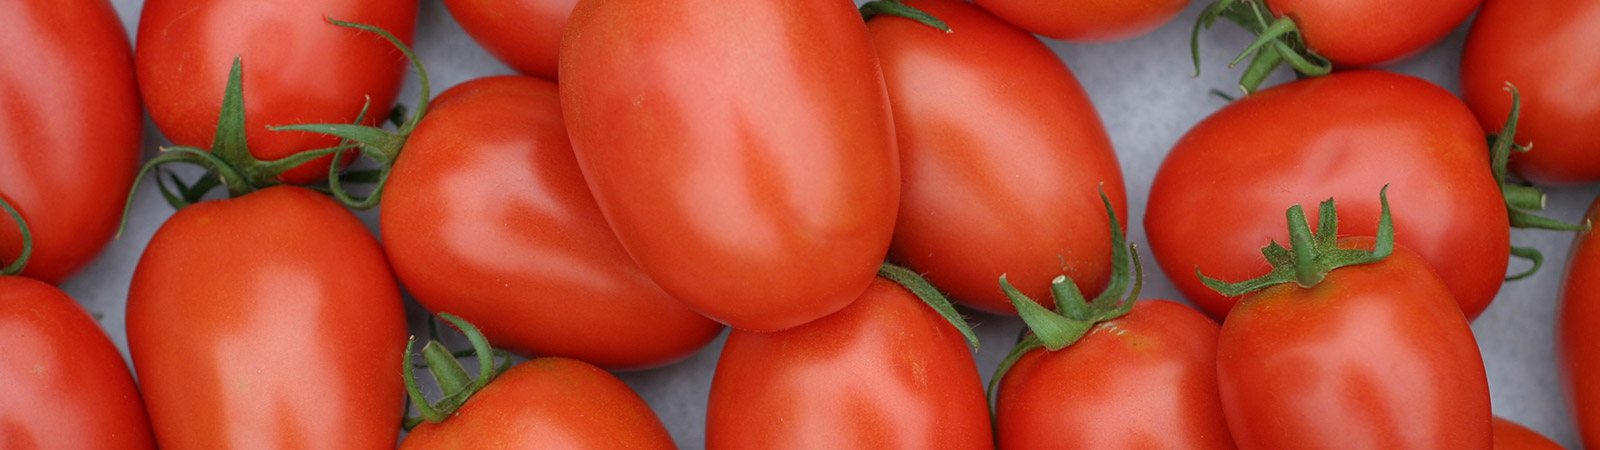 Tomate - Cultivos Gat Fertilíquidos